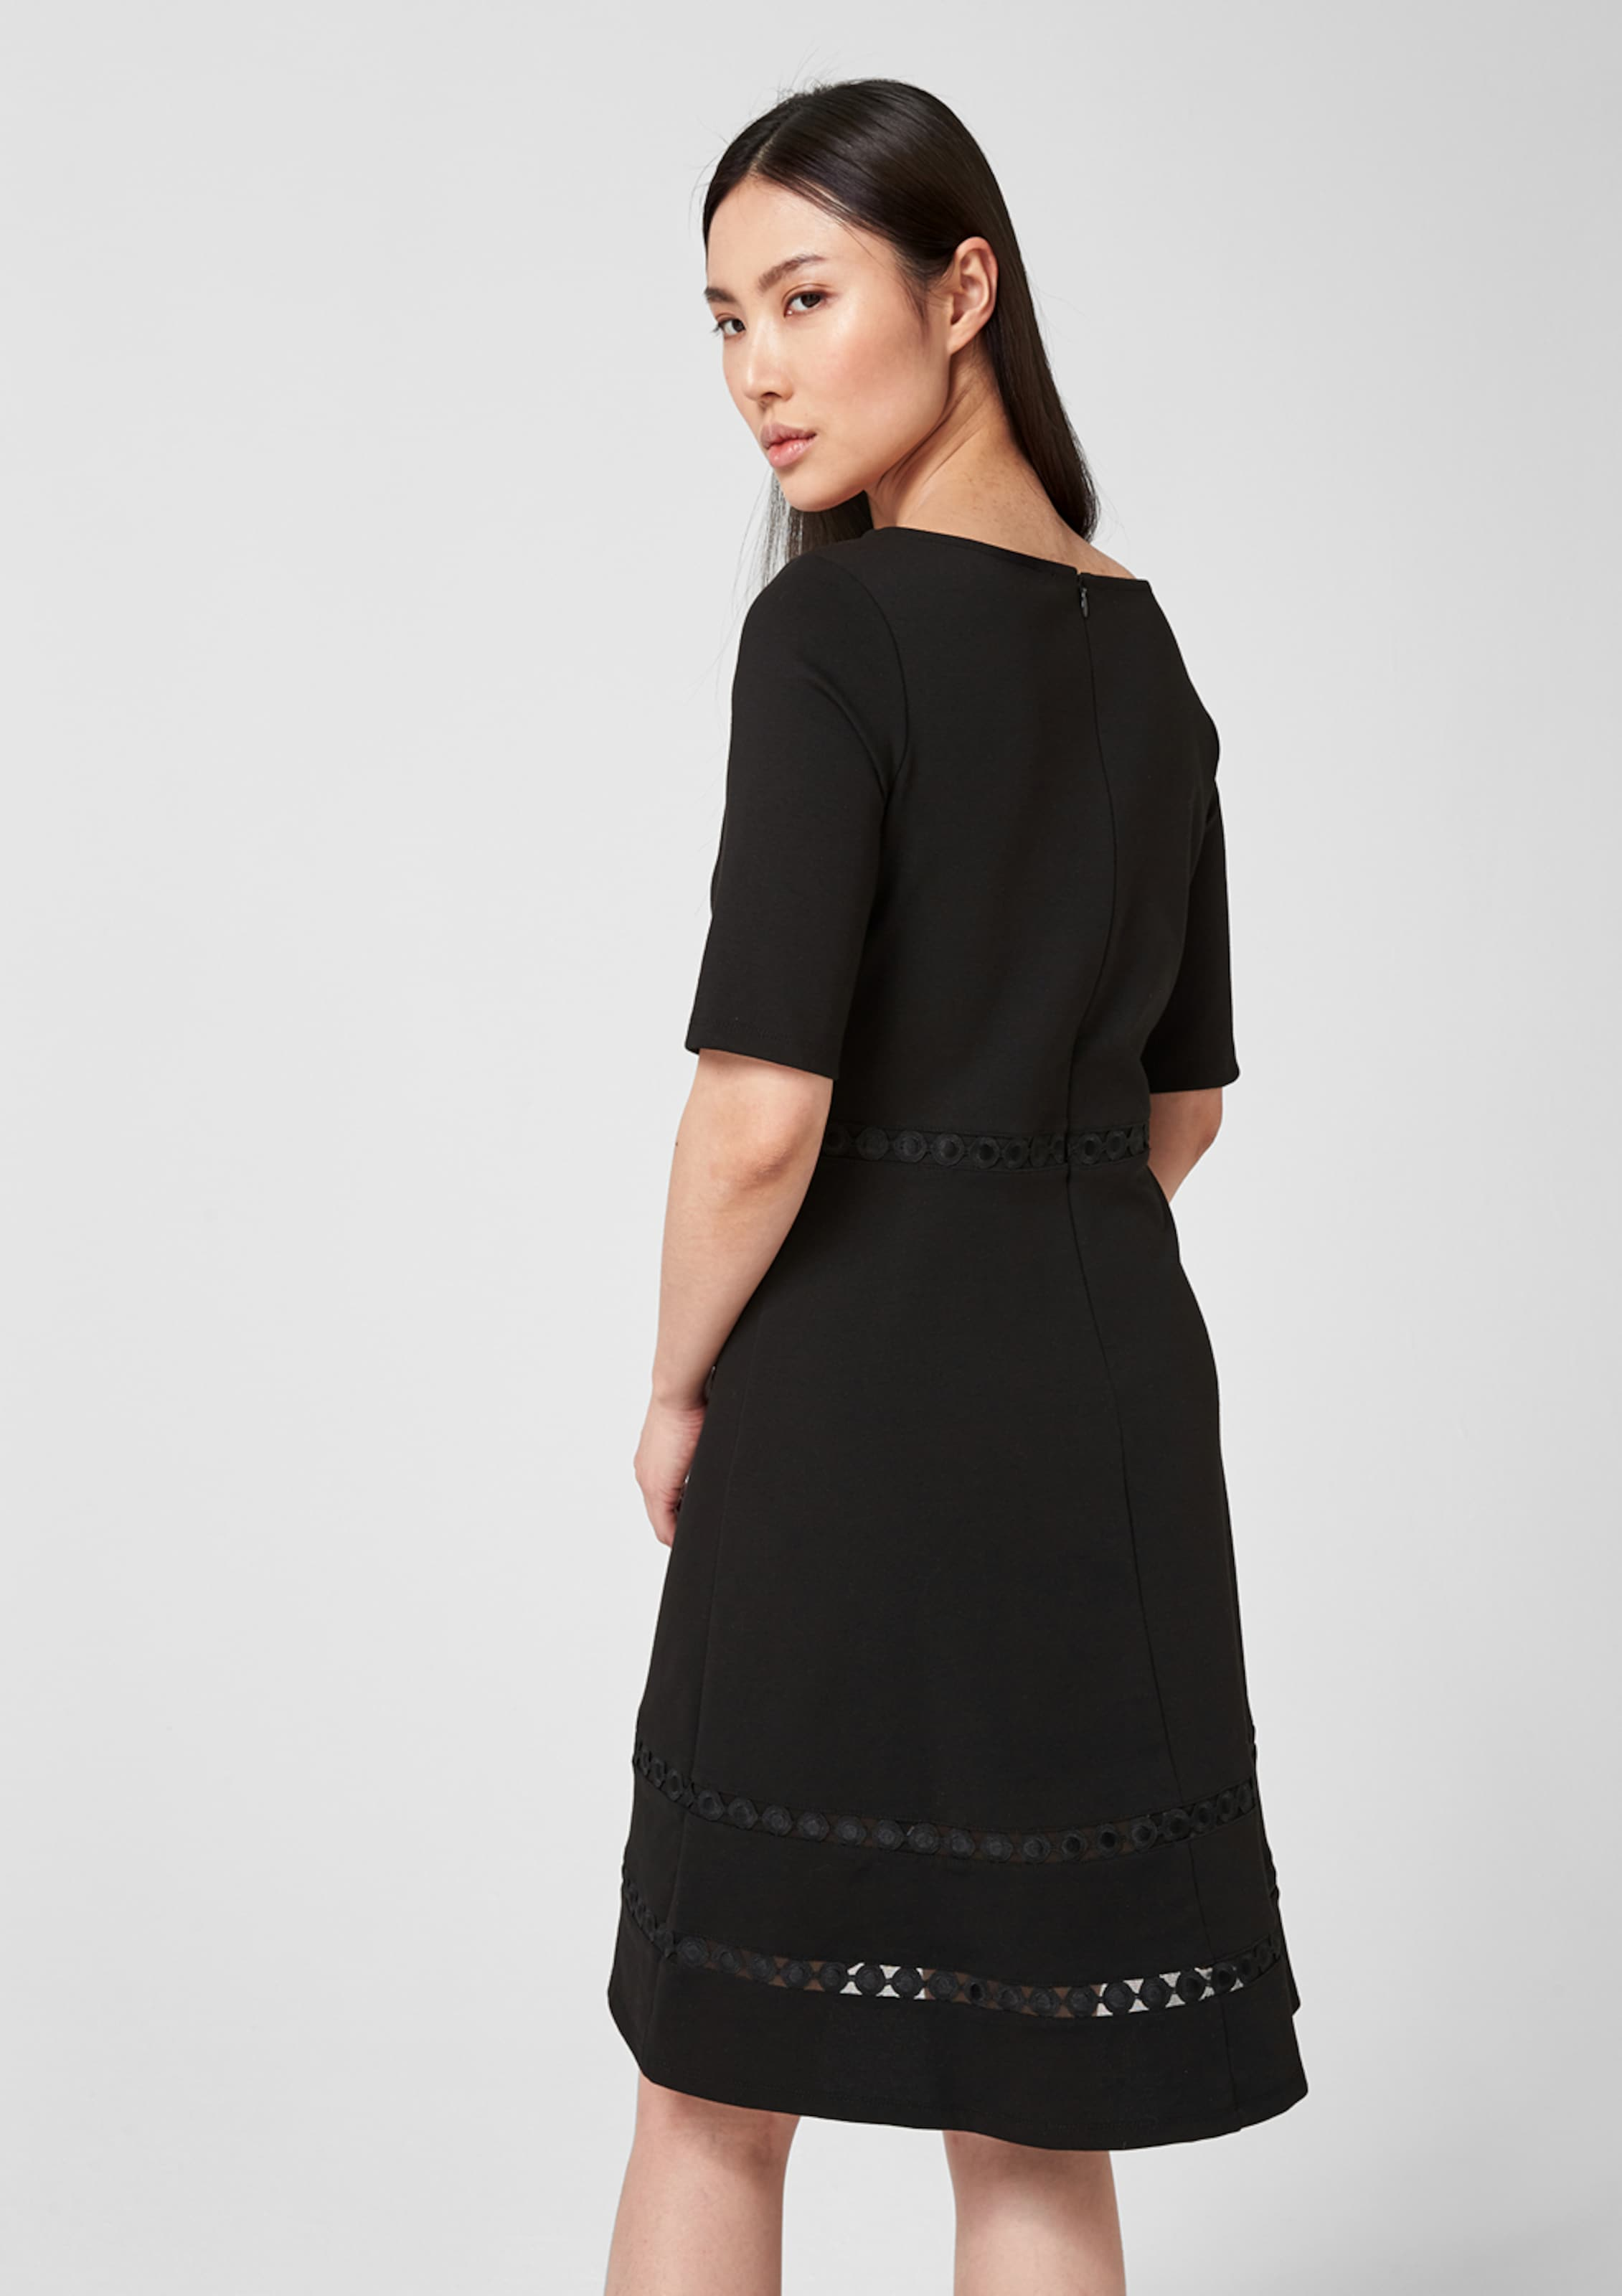 Label Stretchkleid Black In oliver Schwarz S 08OkwXnP